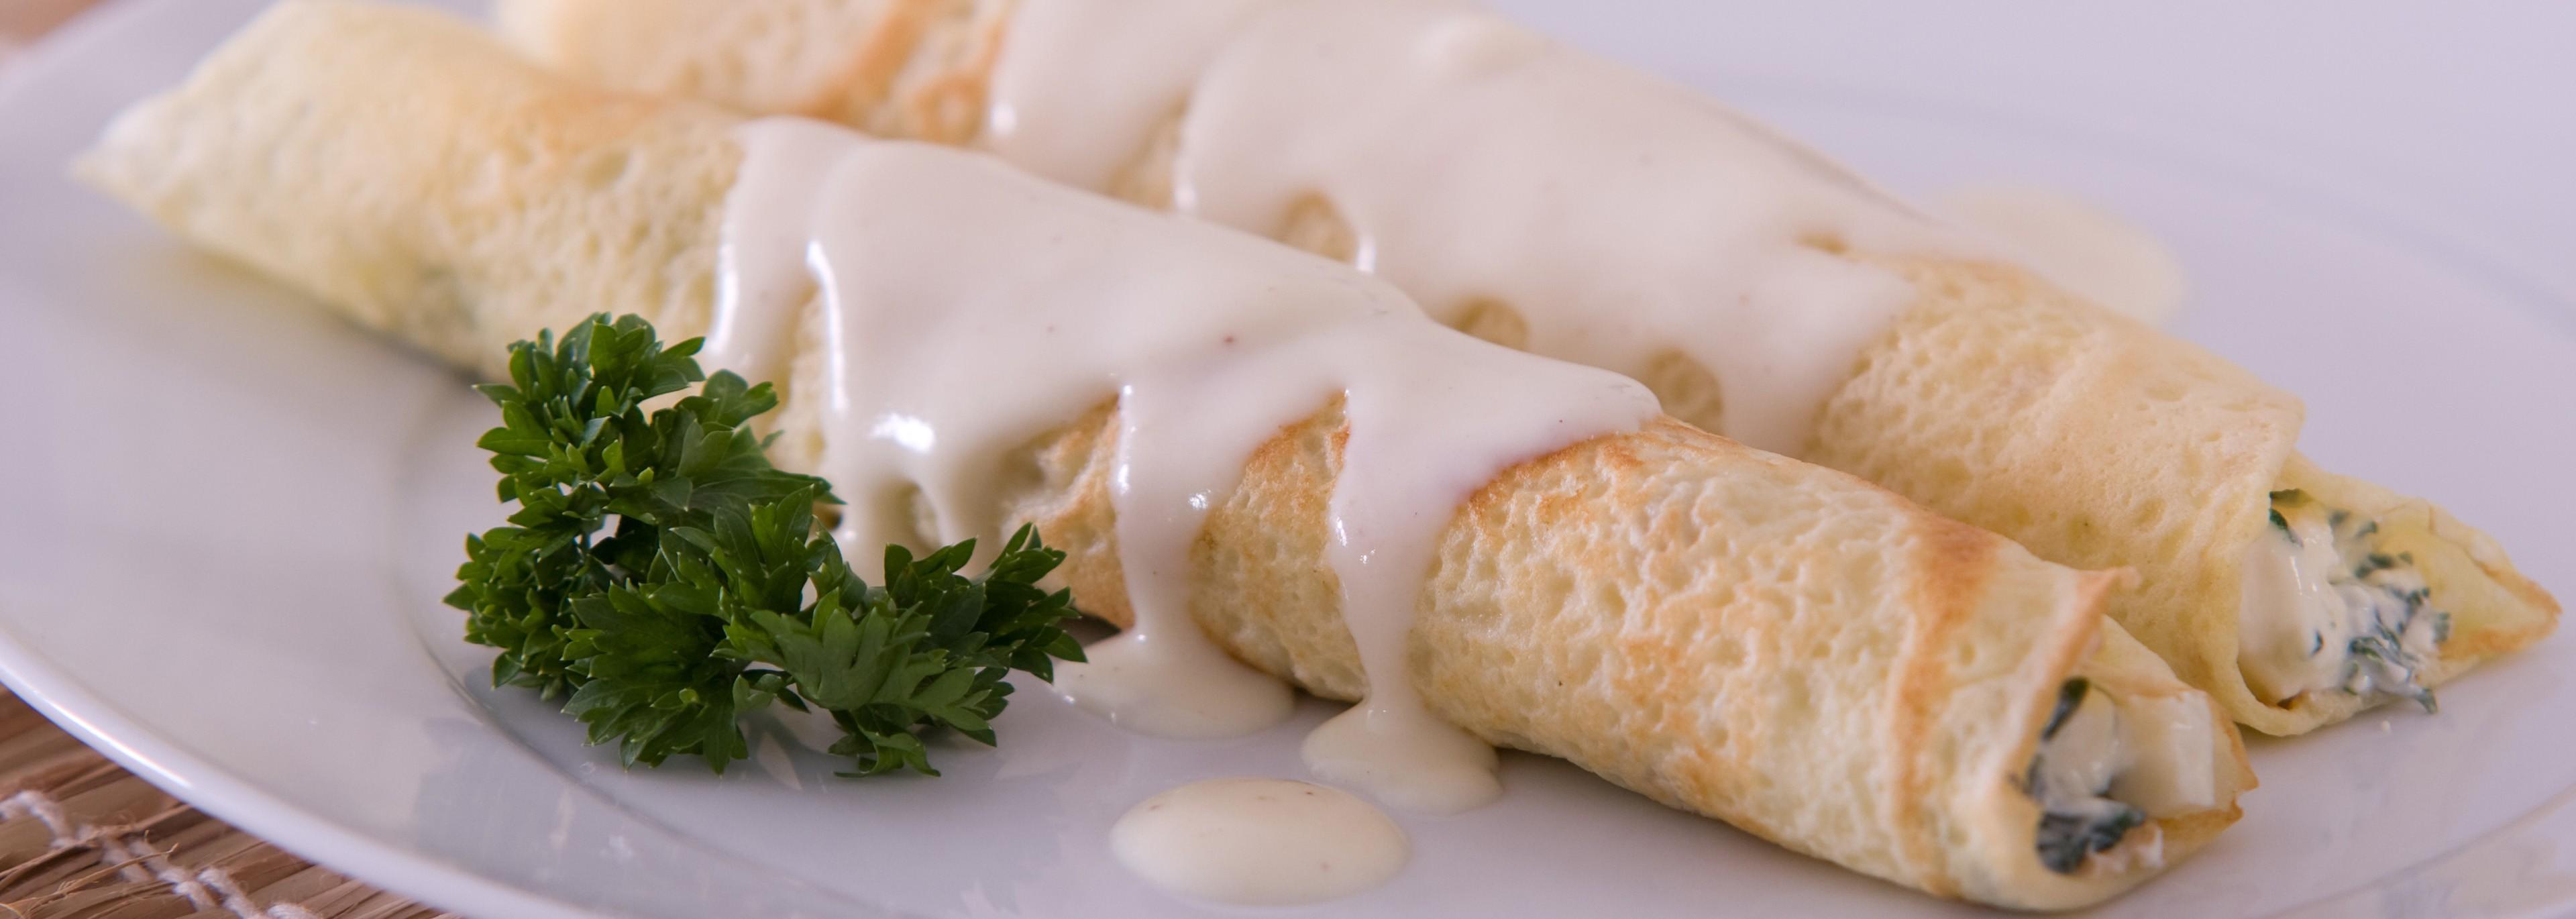 Panqueca de queijo minas com espinafre (Foto: Reproduo)